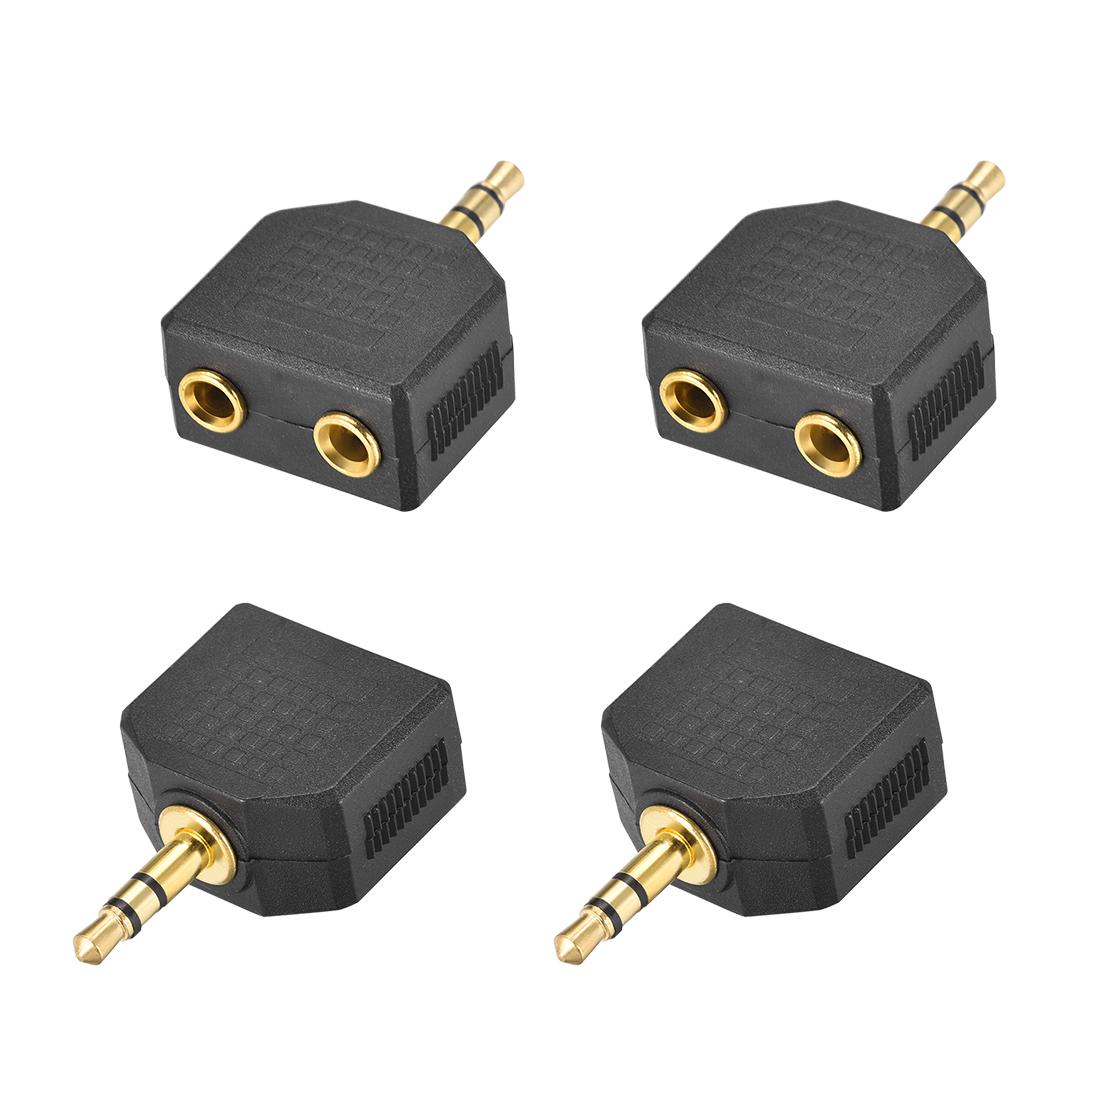 3.5mm Male to Dual 3.5mm Female Splitter Black 4Pcs for Stereo Audio Convert